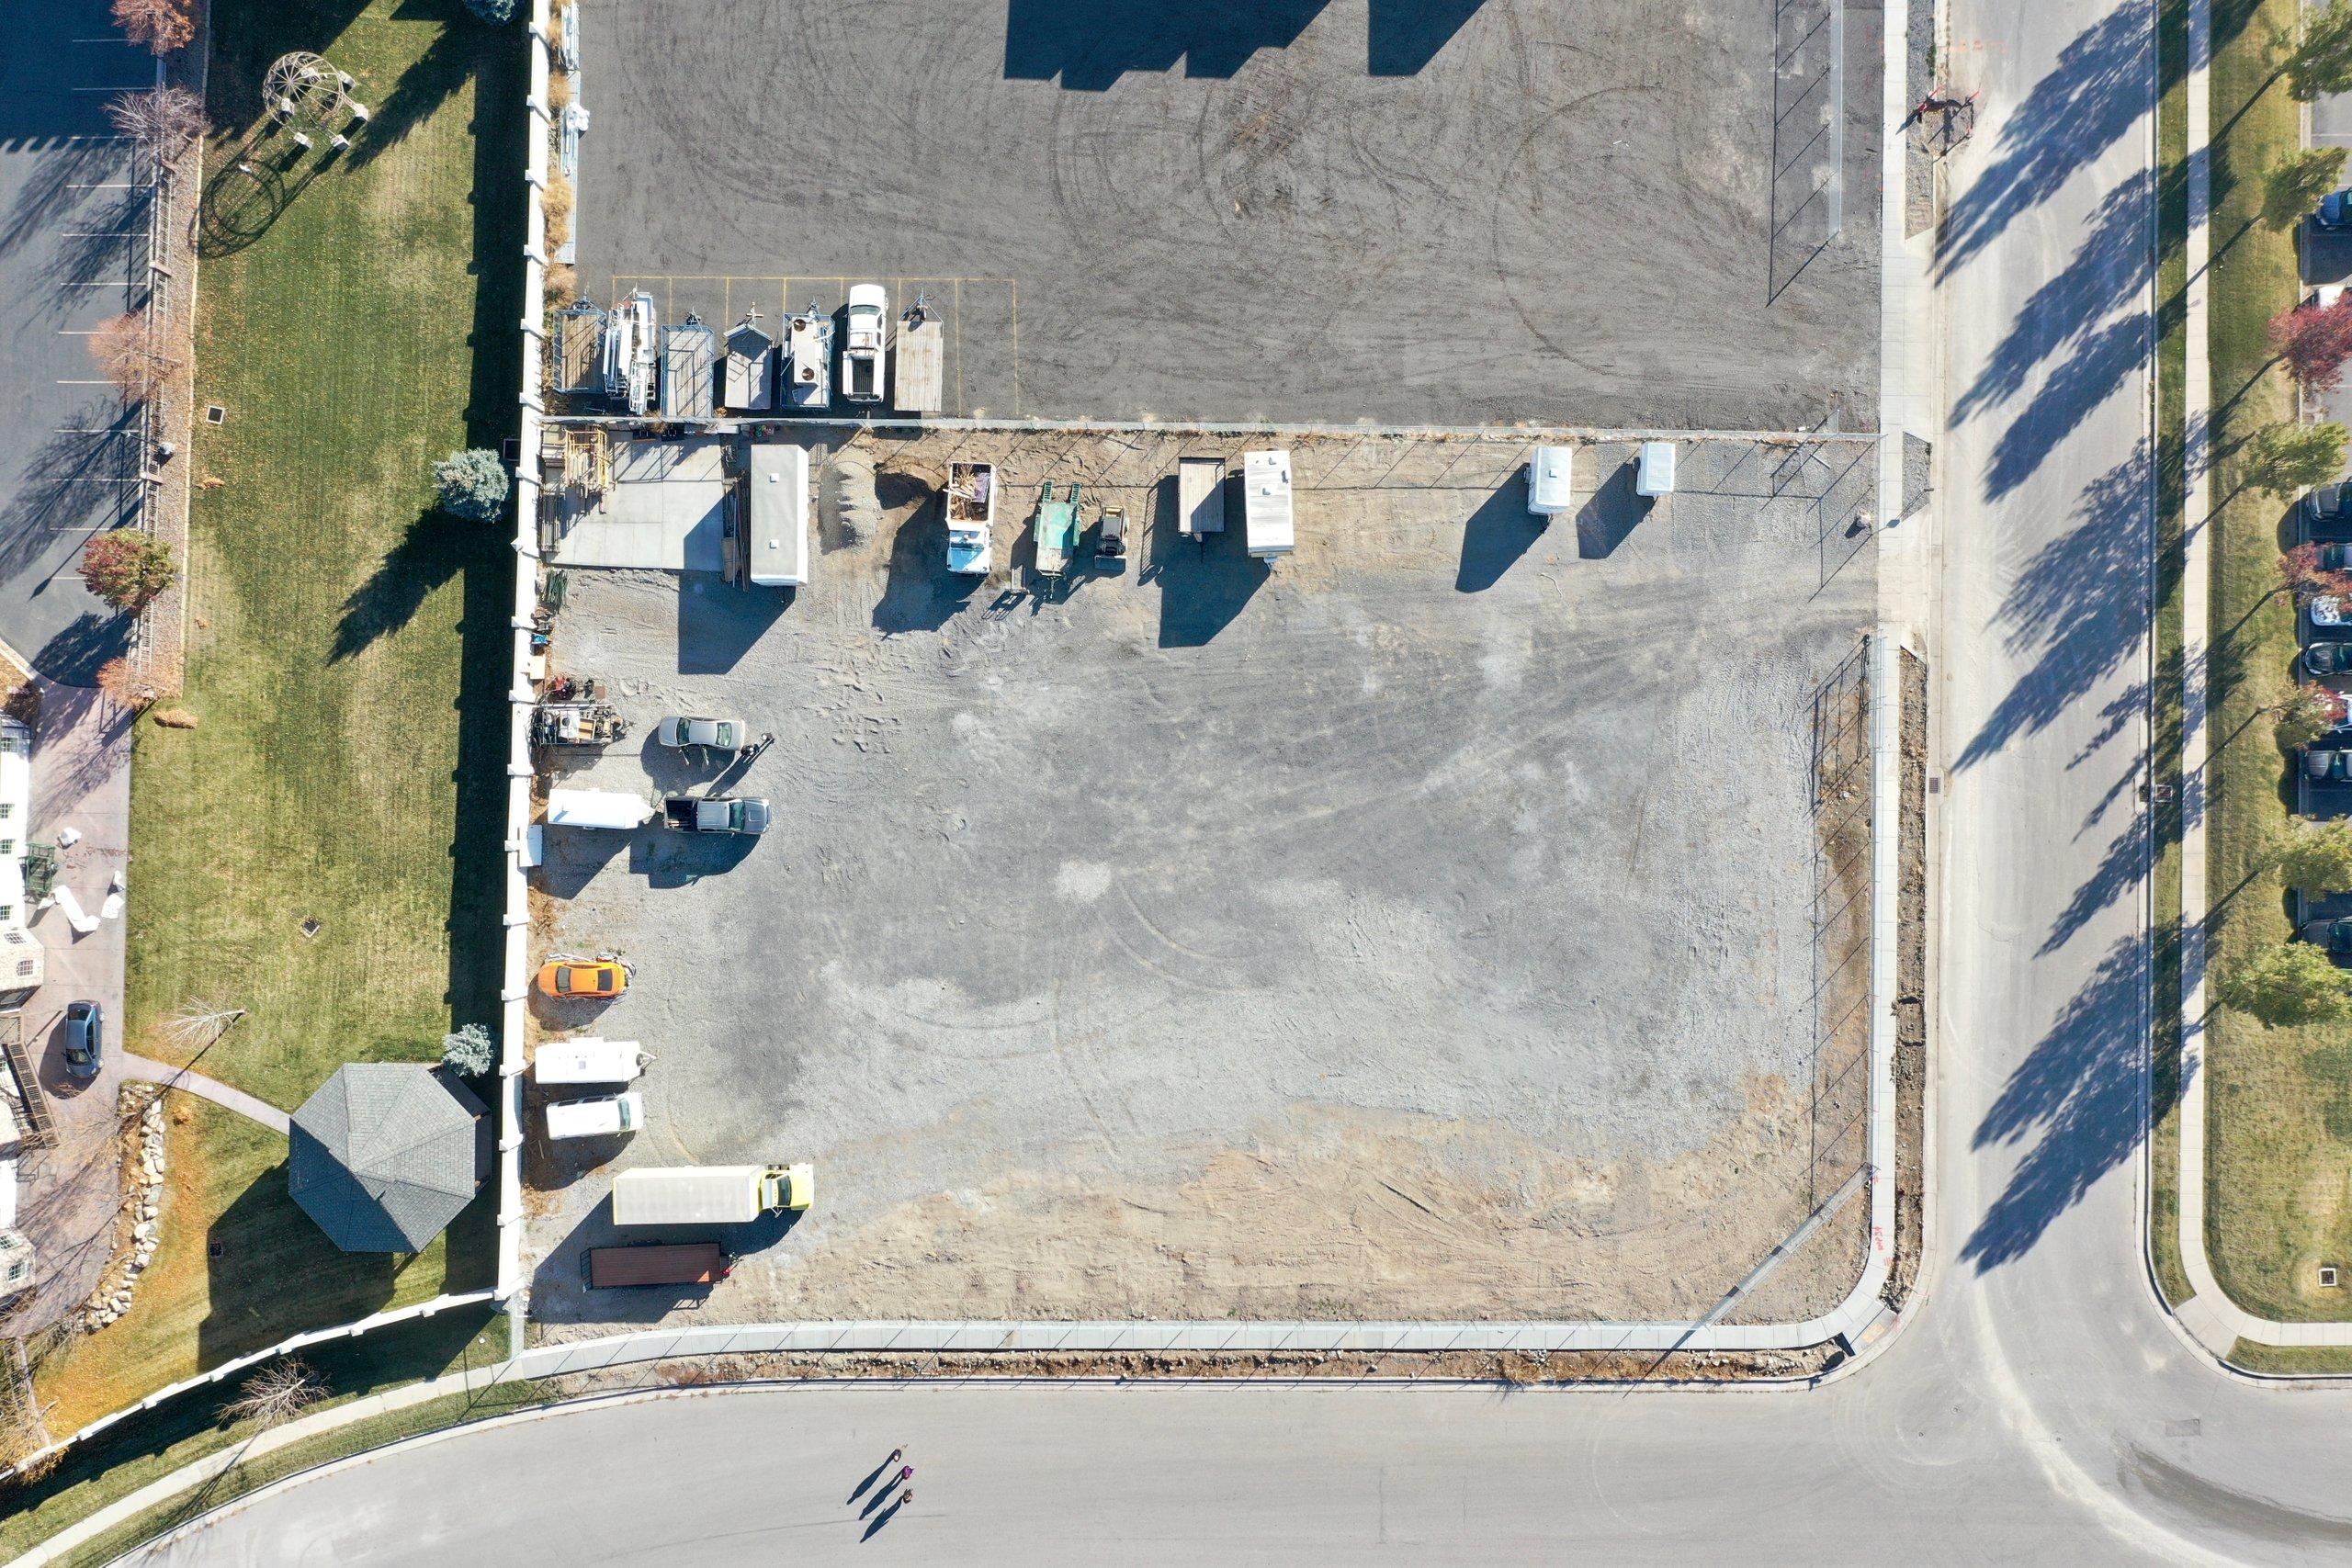 75x45 Unpaved Lot self storage unit